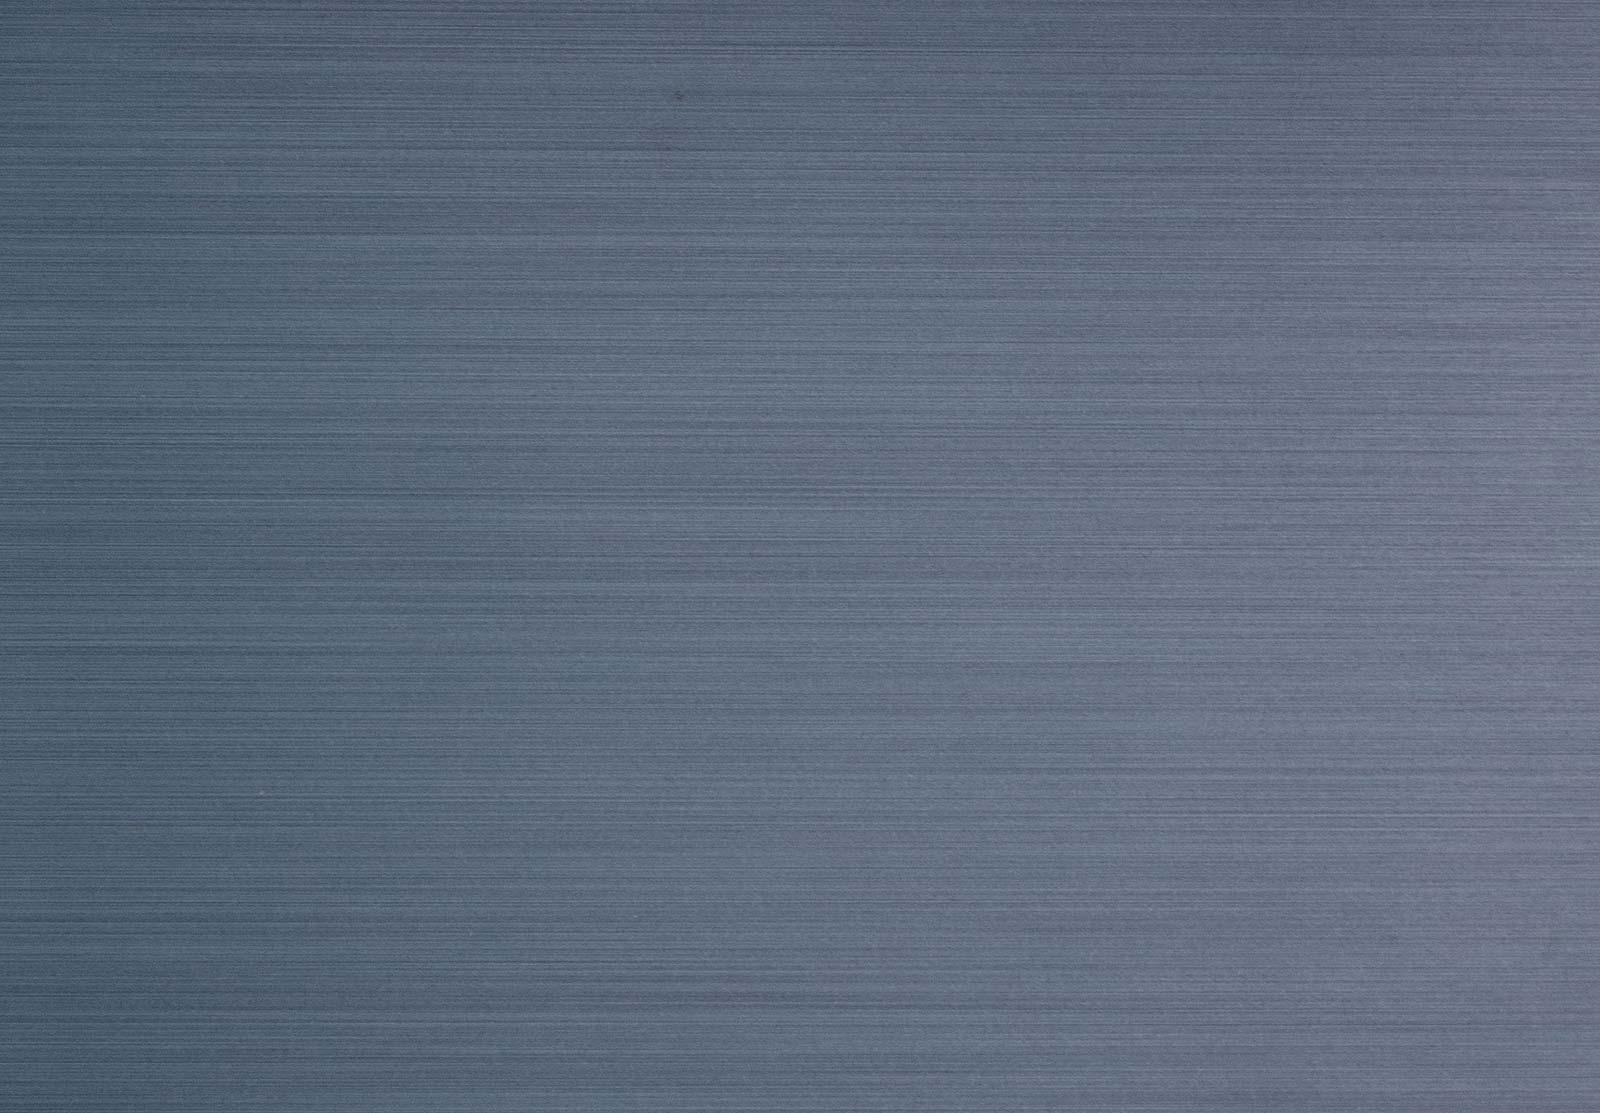 Pannelli alfawood - Splendor 3016